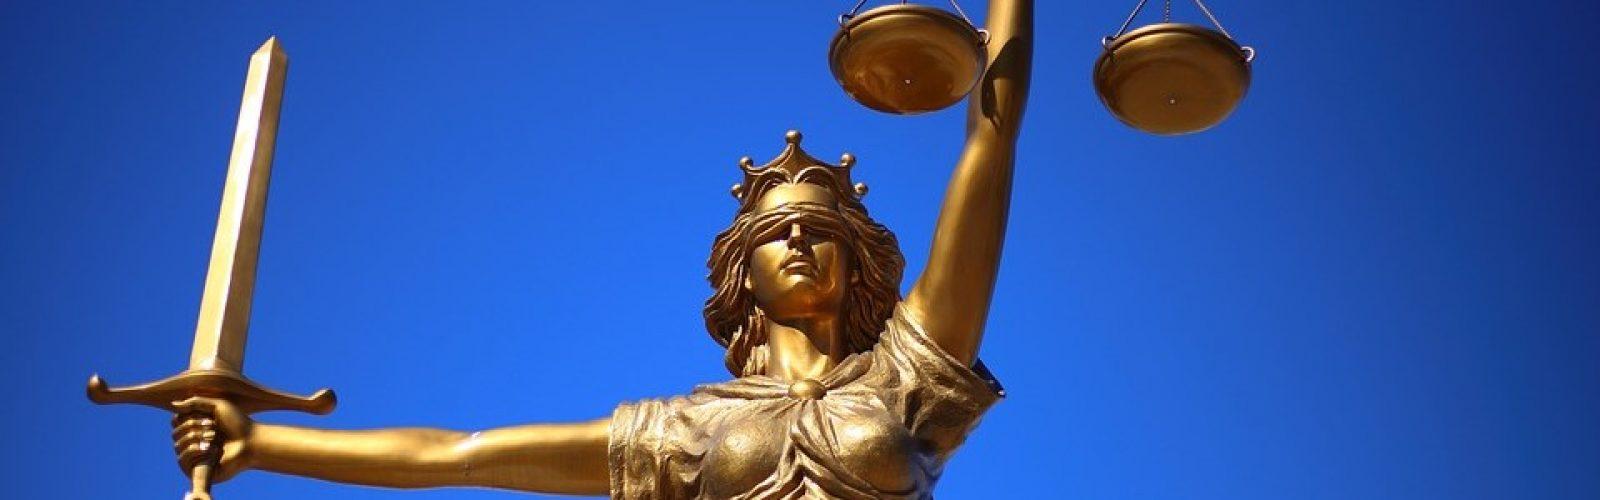 justice-statue-169